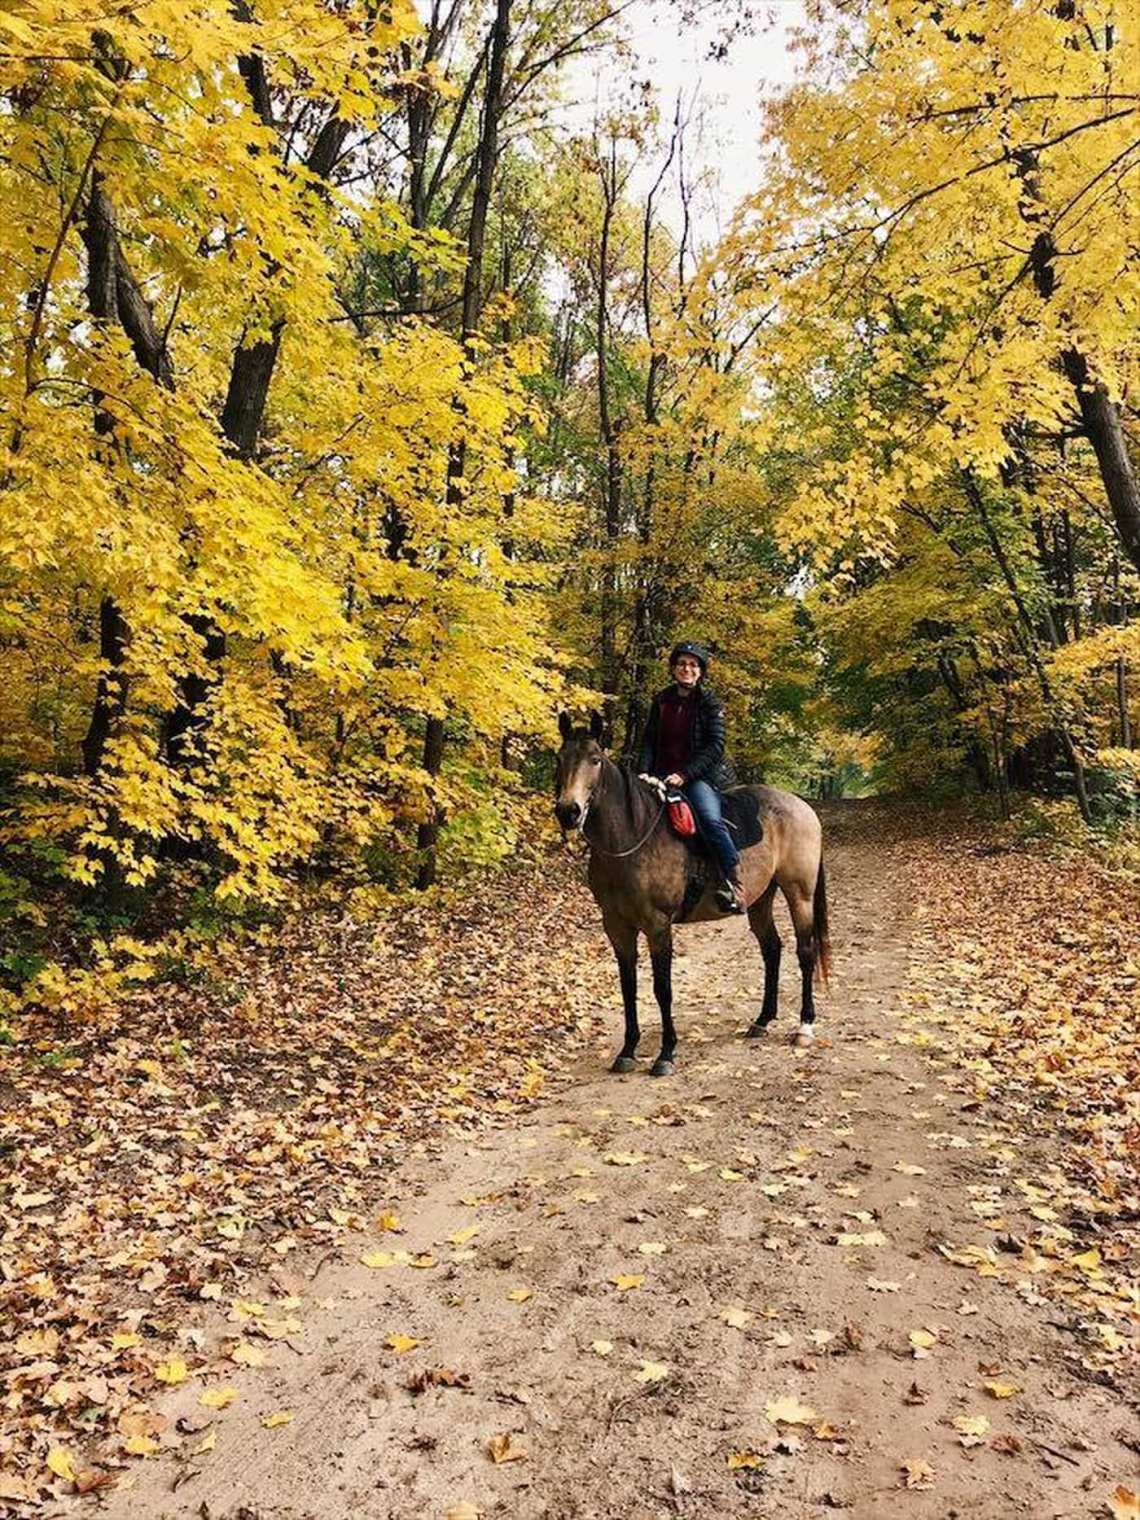 Women poses on horseback in the woods beneath yellow autumn foliage.